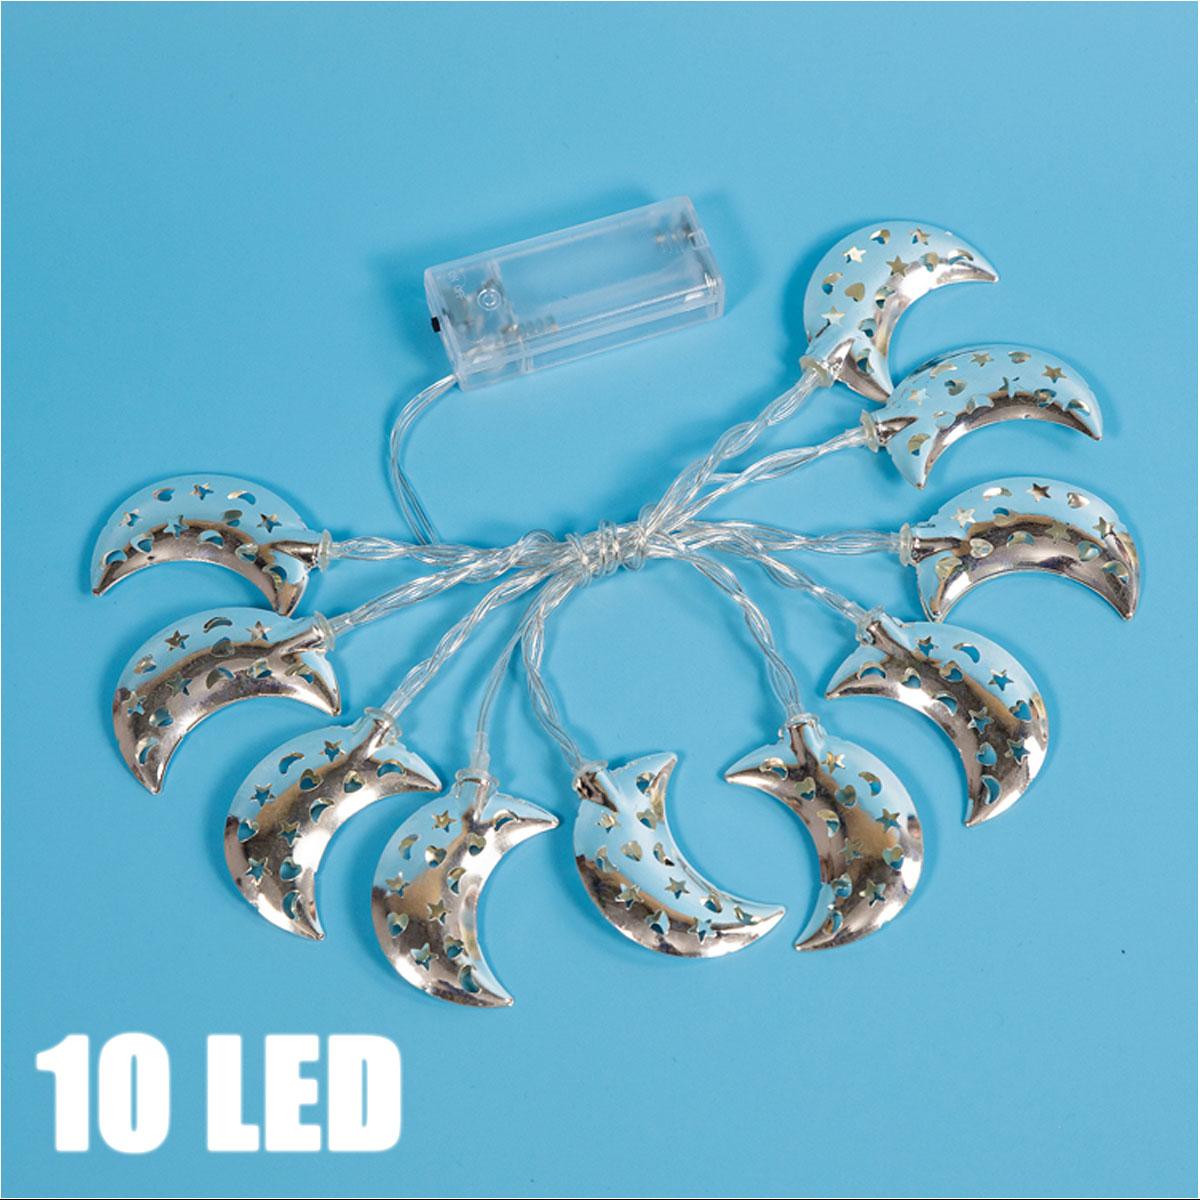 Smuxi Eid Ramadan Islamic10 LED String Light Silver Allah Moon Star Battery Home Decor